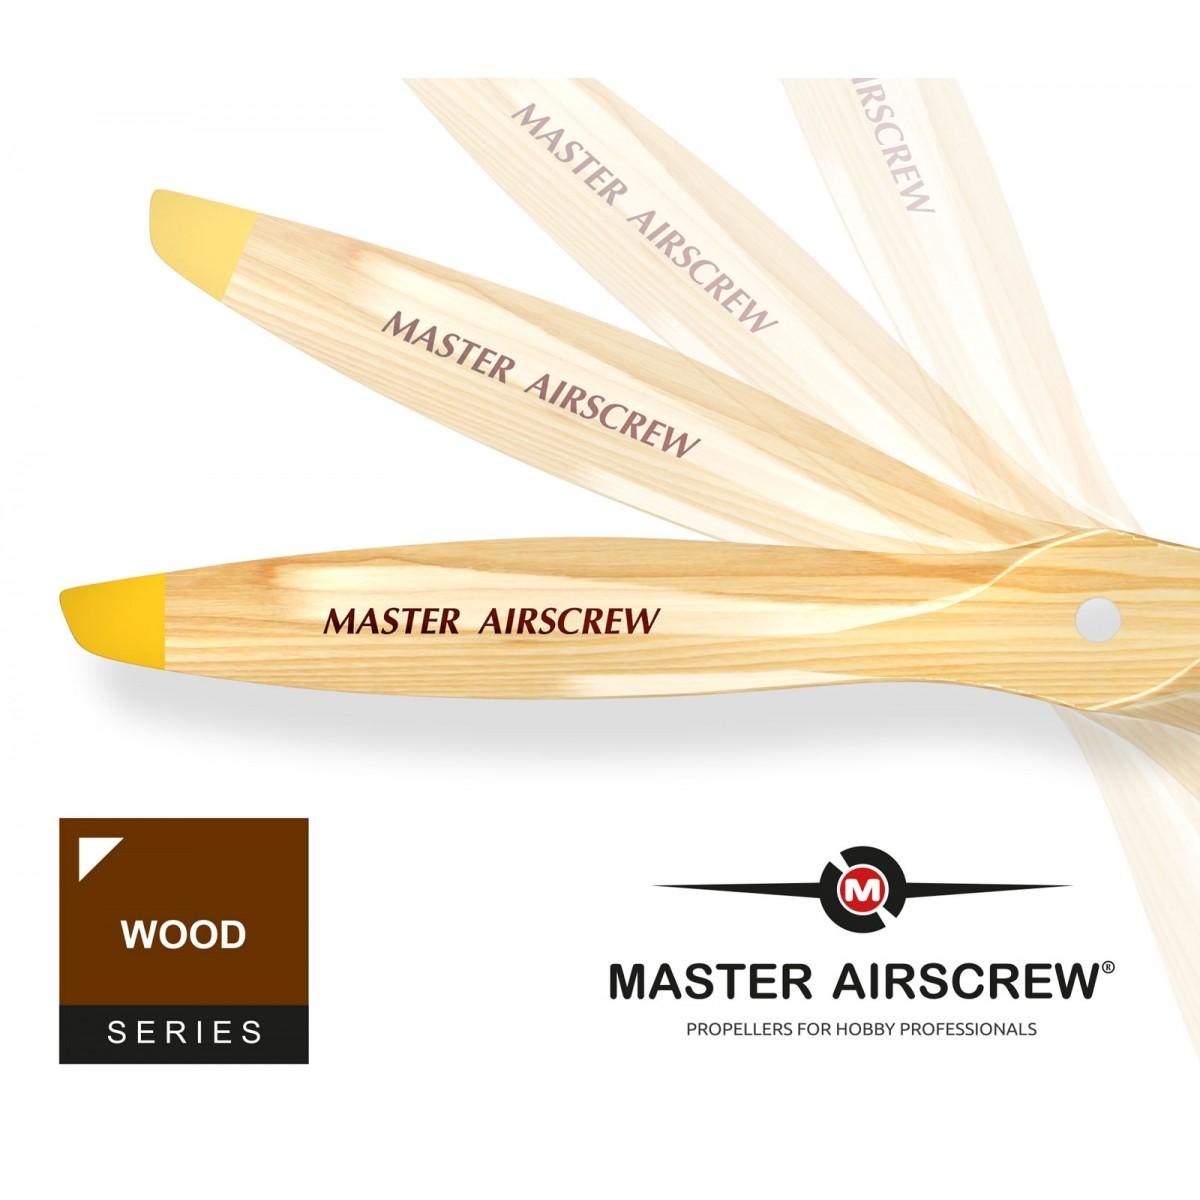 MA1380B - Hélice Master Airscrew Wood Series 13x8